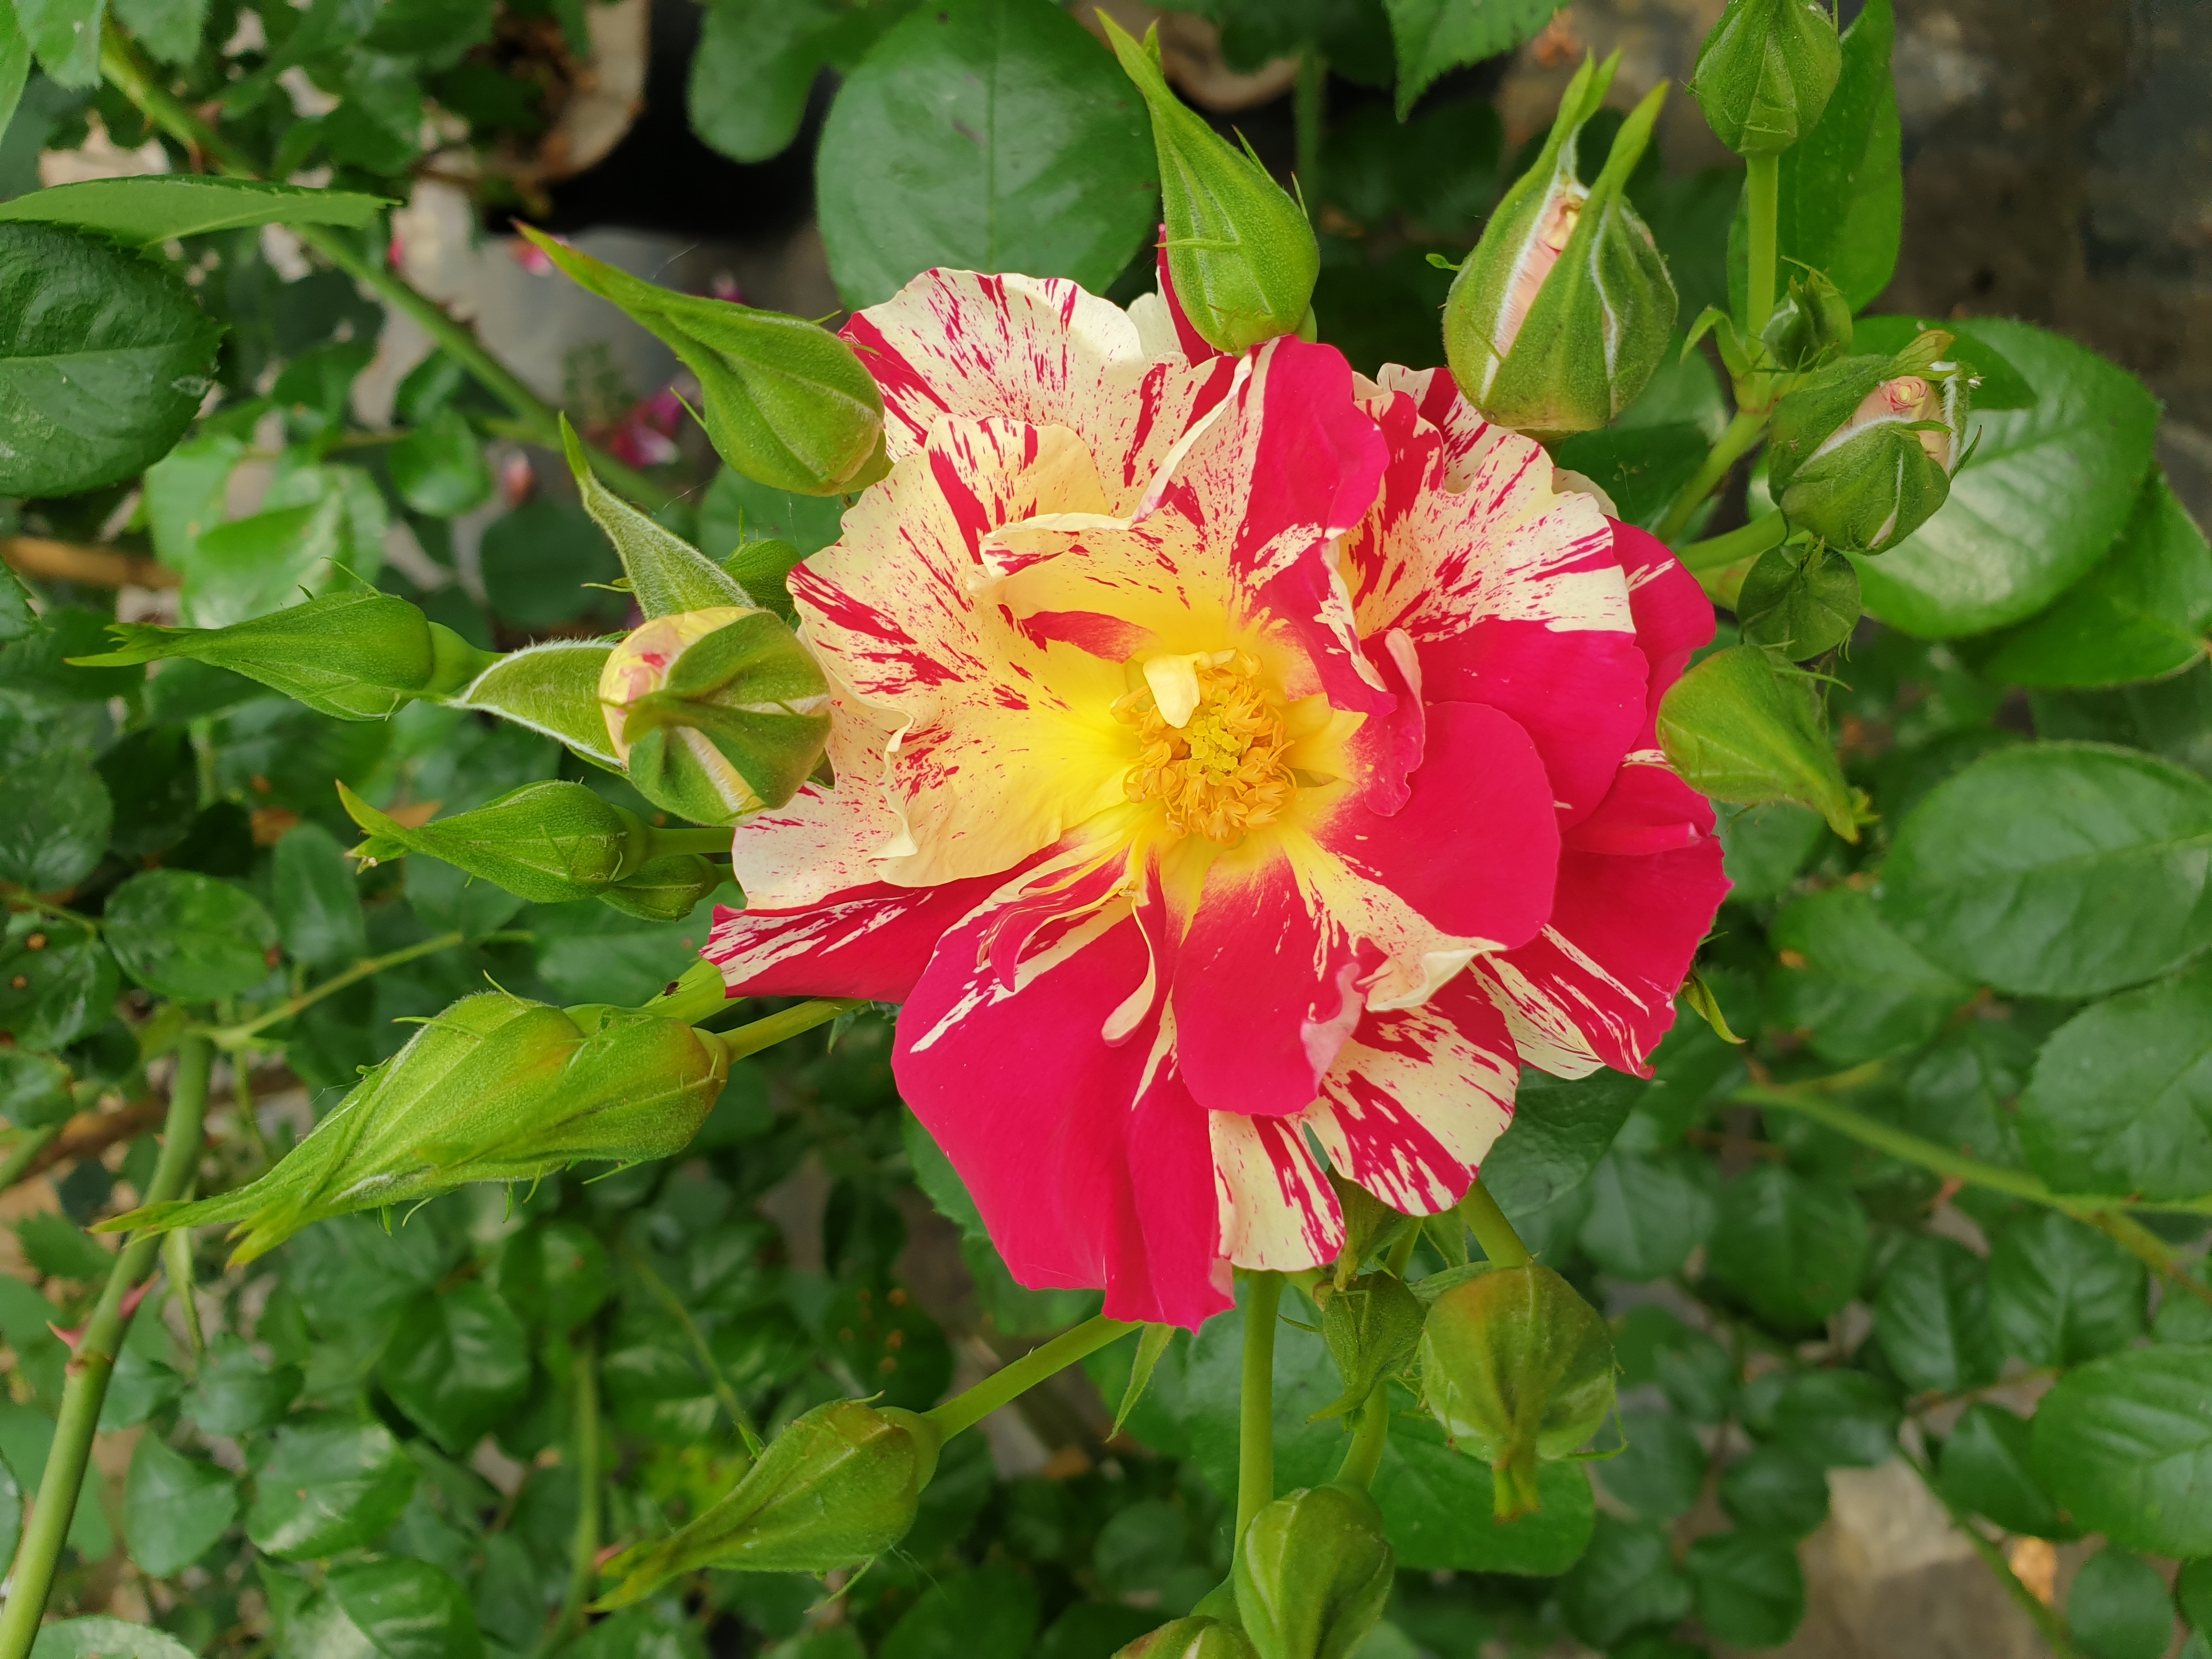 Rose Vihaipi